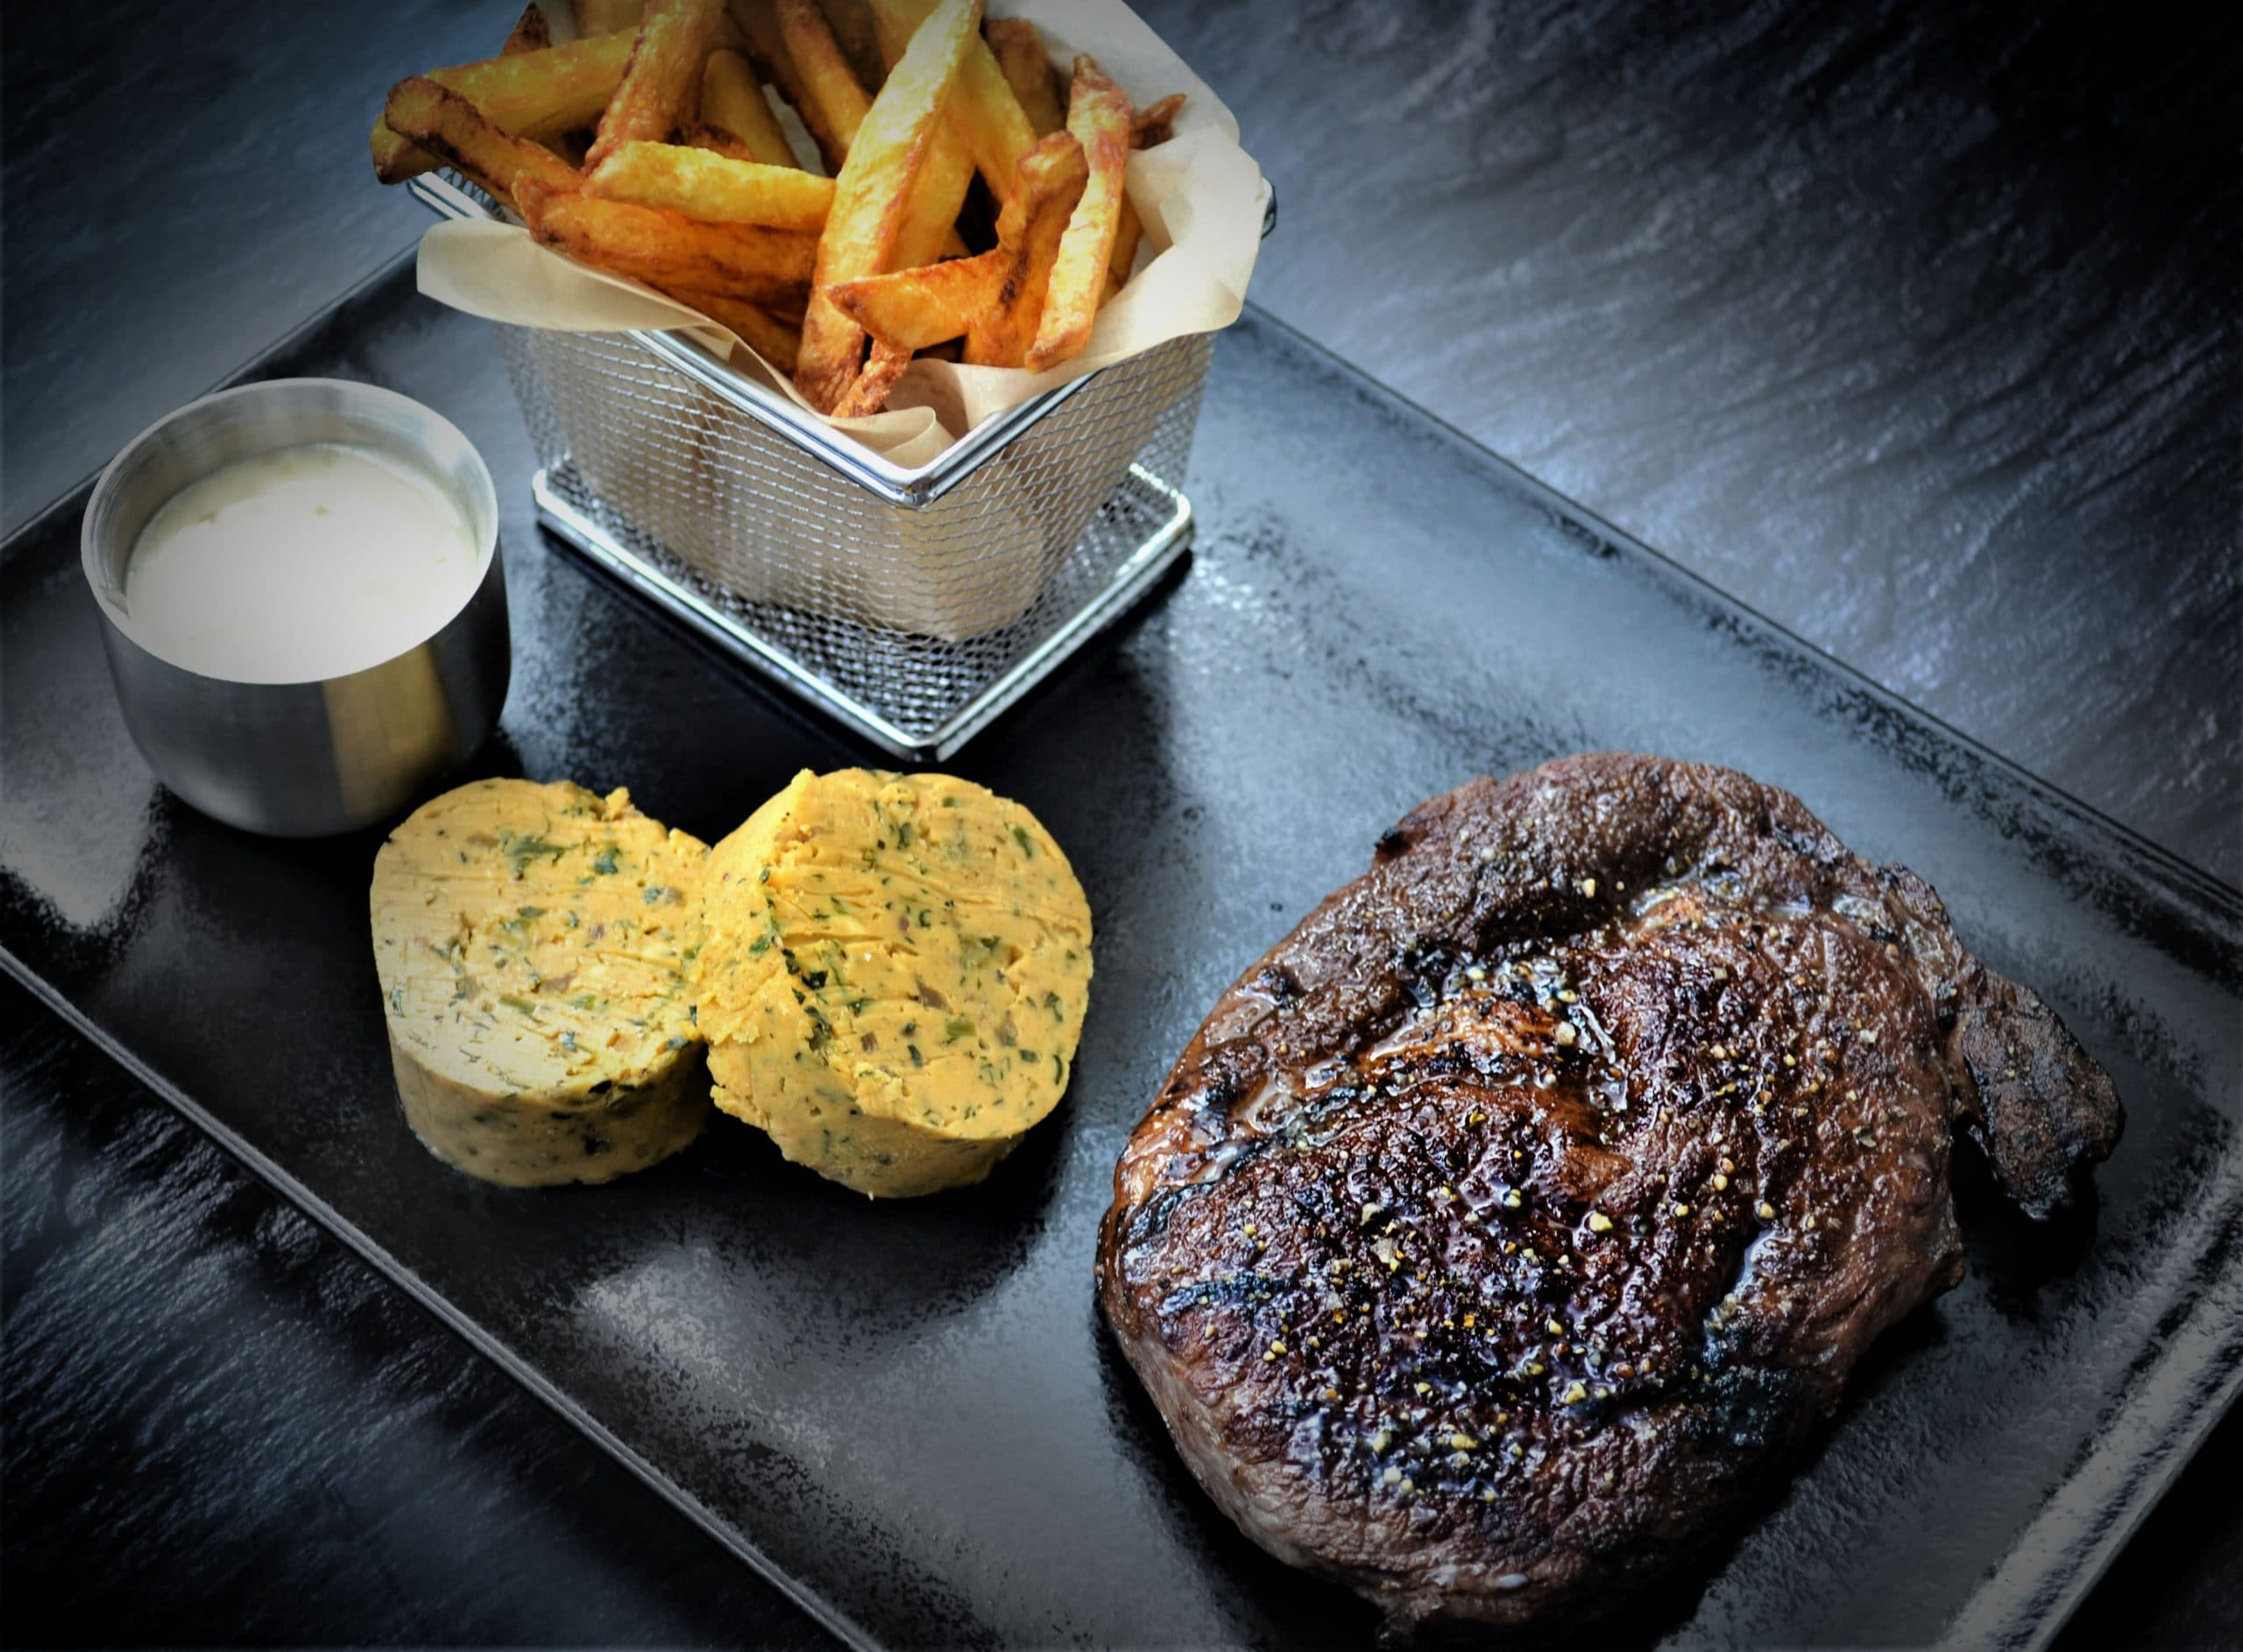 Gebeeftes Entrecôte   Café de Paris Butter   Homemade Fries   Beefer Aioli